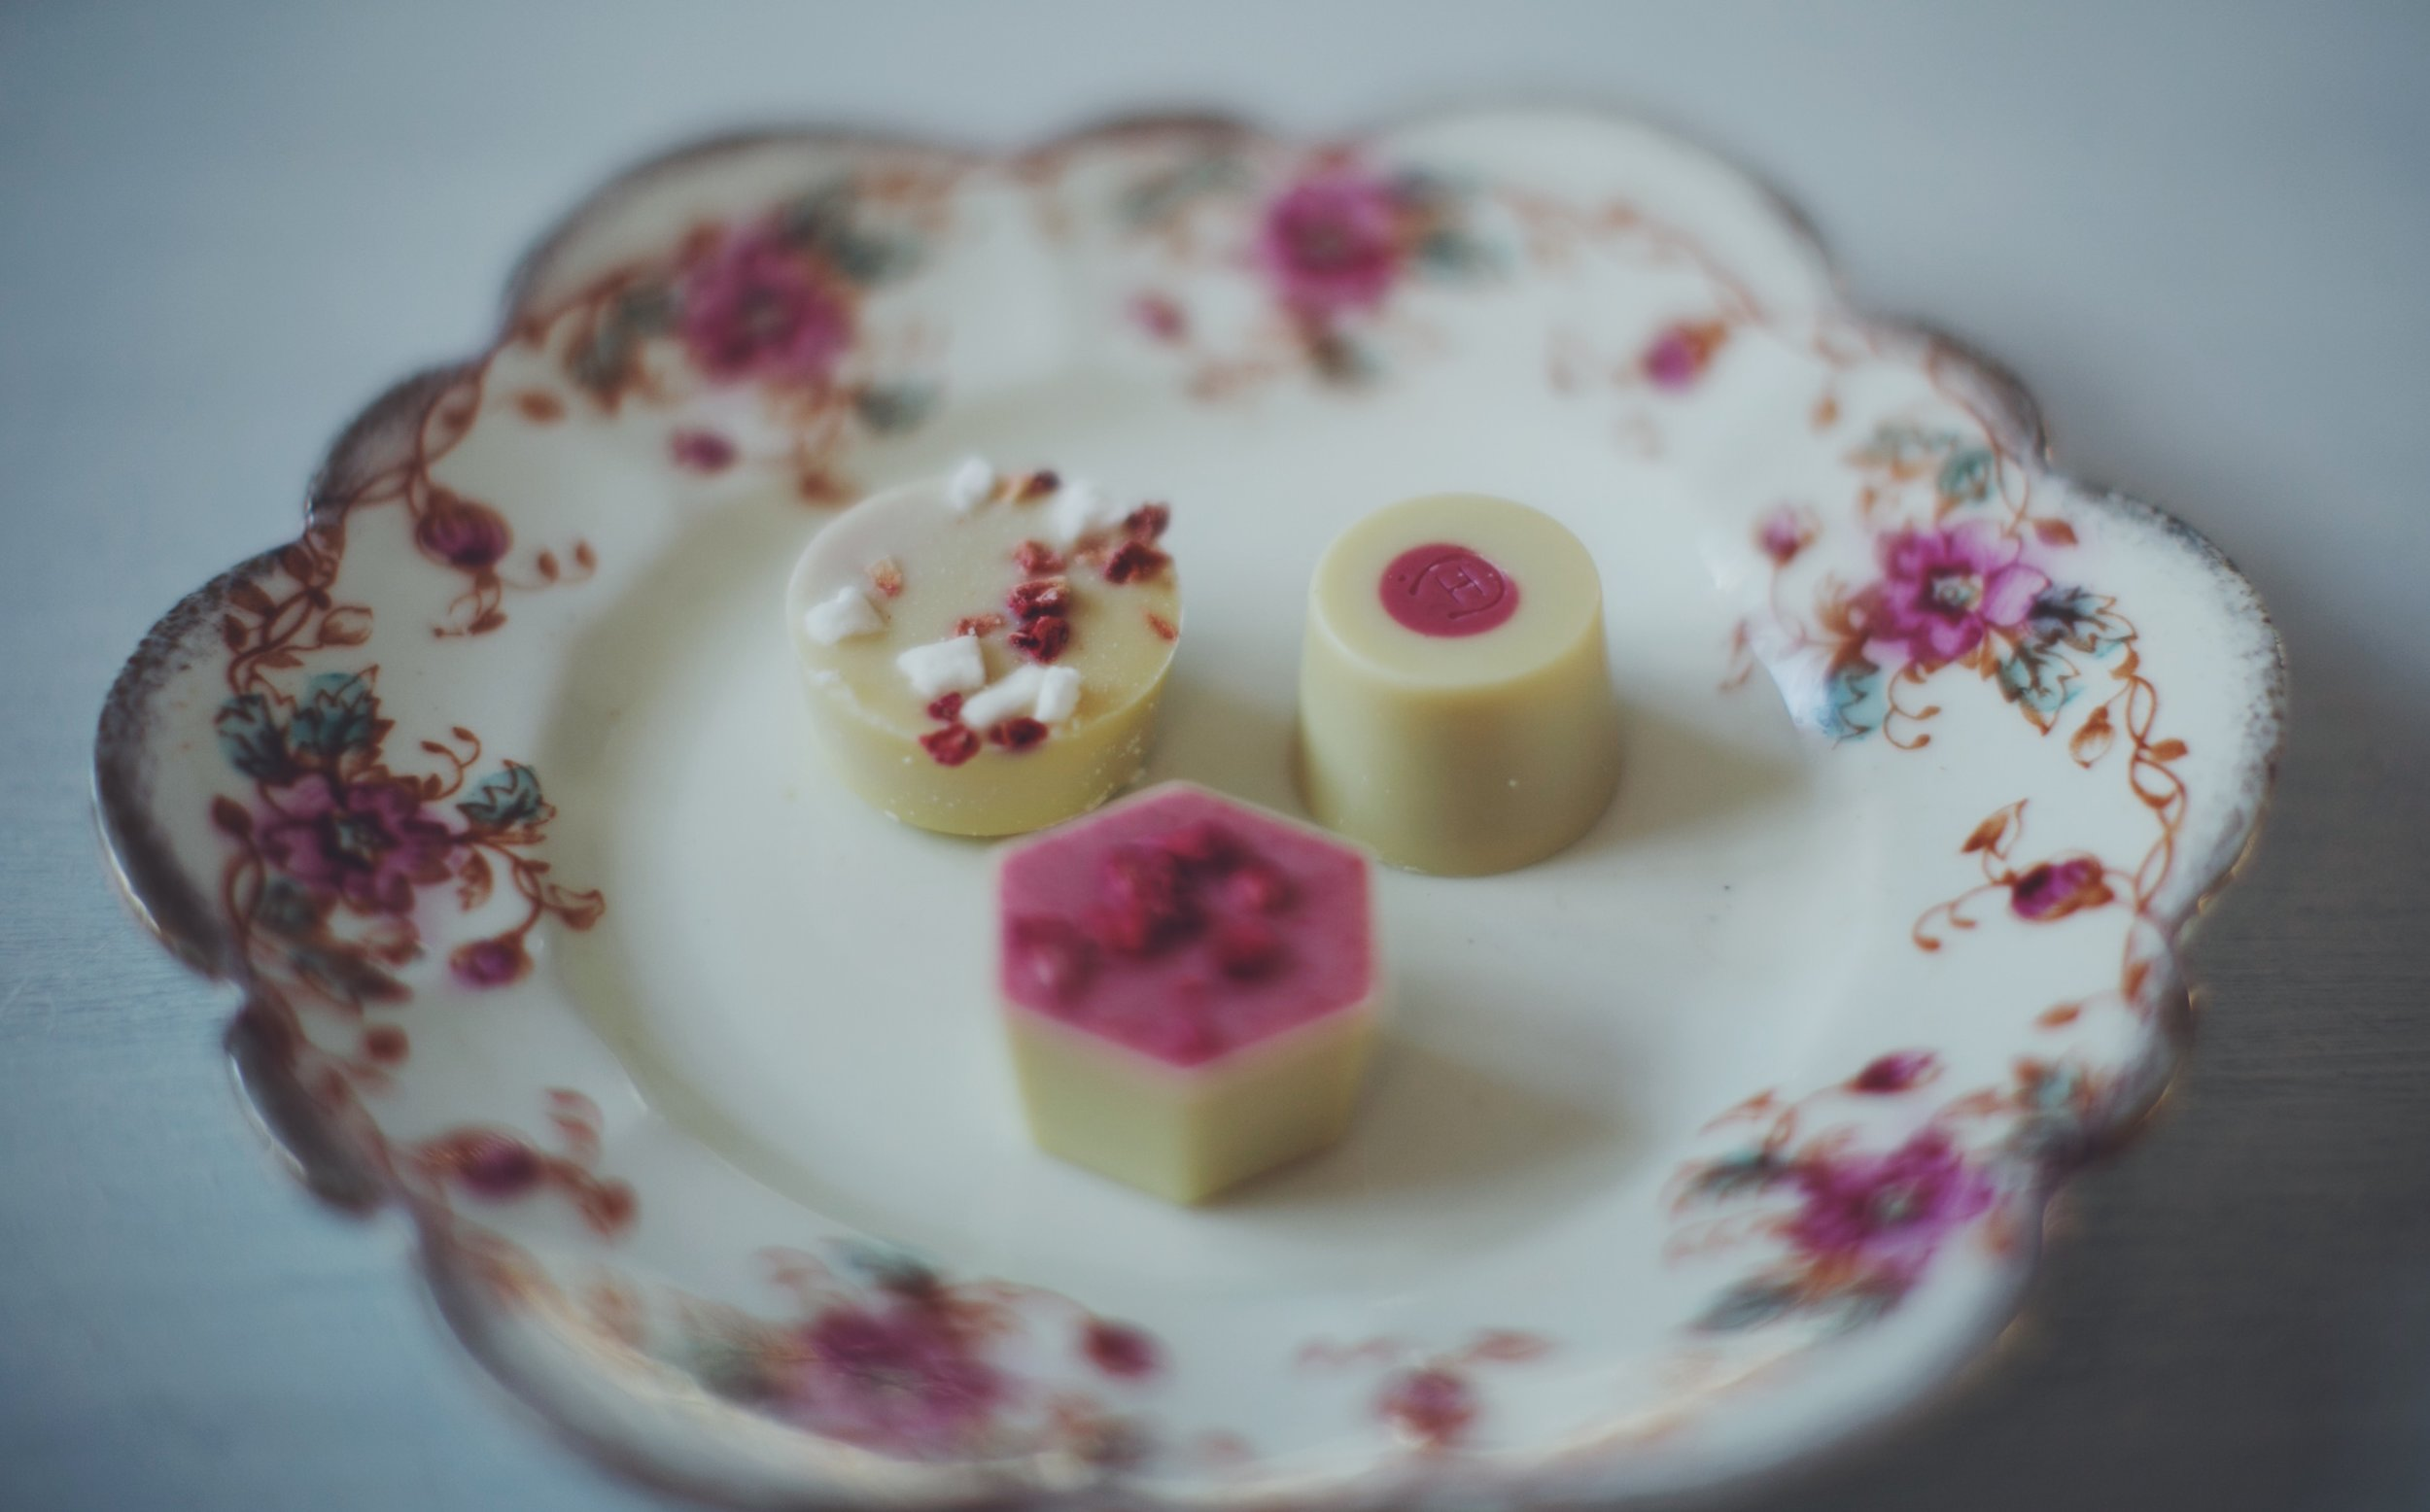 Selection of Selectors:Eton Mess Selector on left, Strawberry Selector on right, Strawberry Cheesecake Selector bottom.